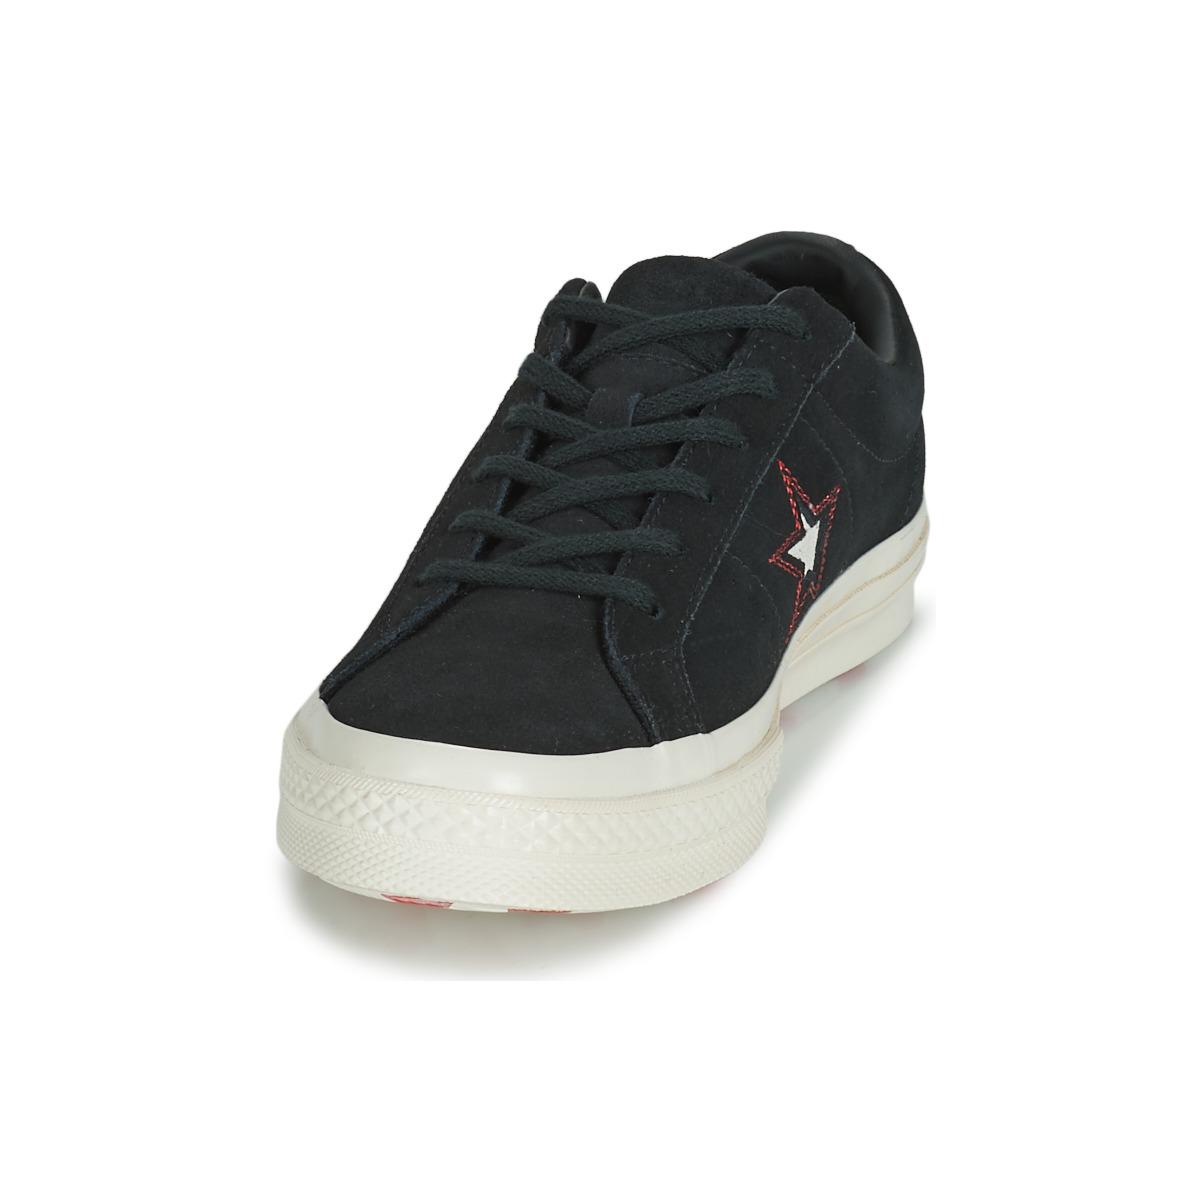 buy online 85203 eb7cc Converse Gratuite 67 One Chaussures The Ox € Suede Femme Details  NoirLivraison Baskets 99 In Basses Love Star Y76yfgb